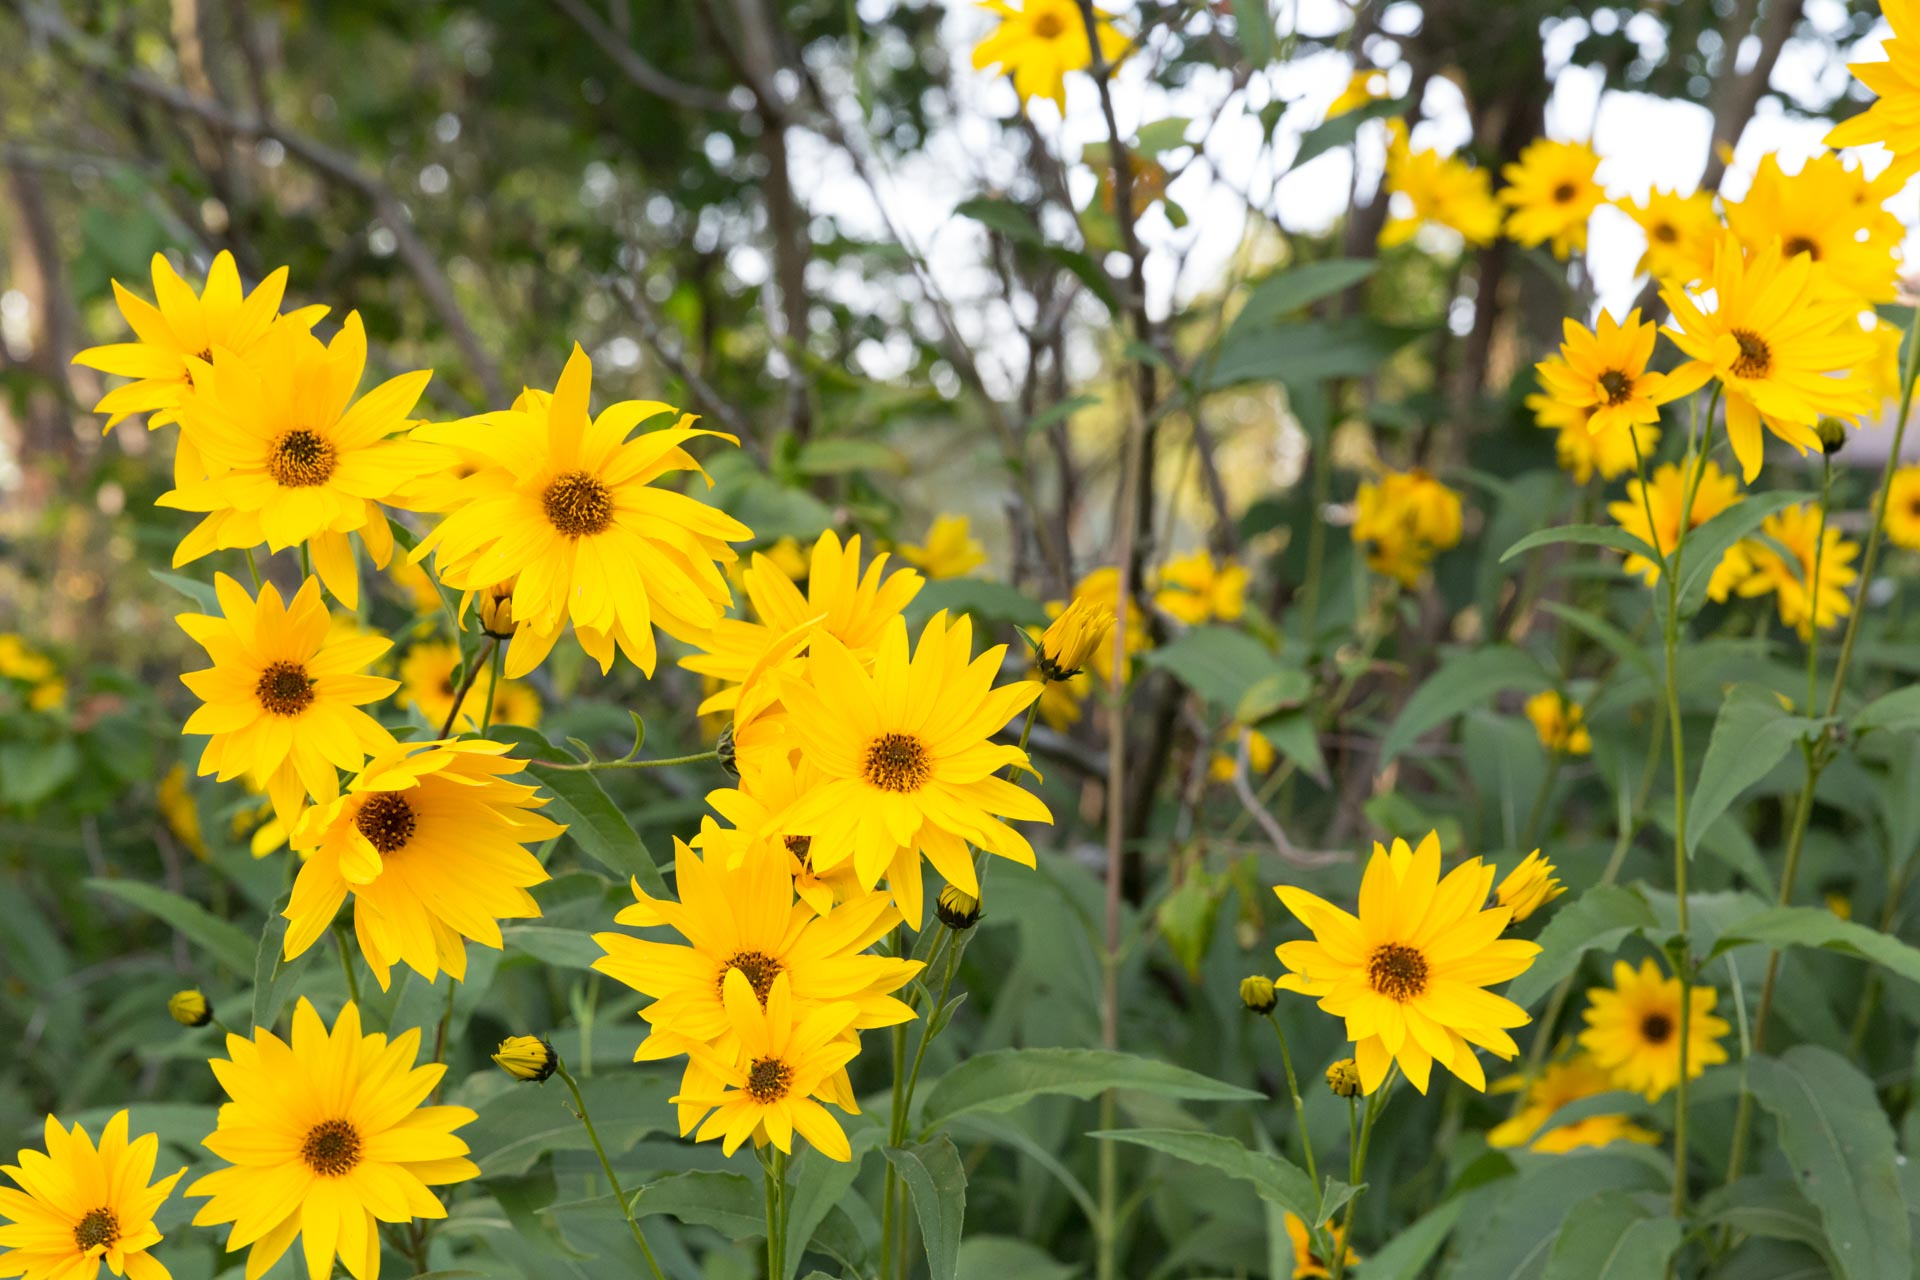 yellow flowers in The Ferg garden